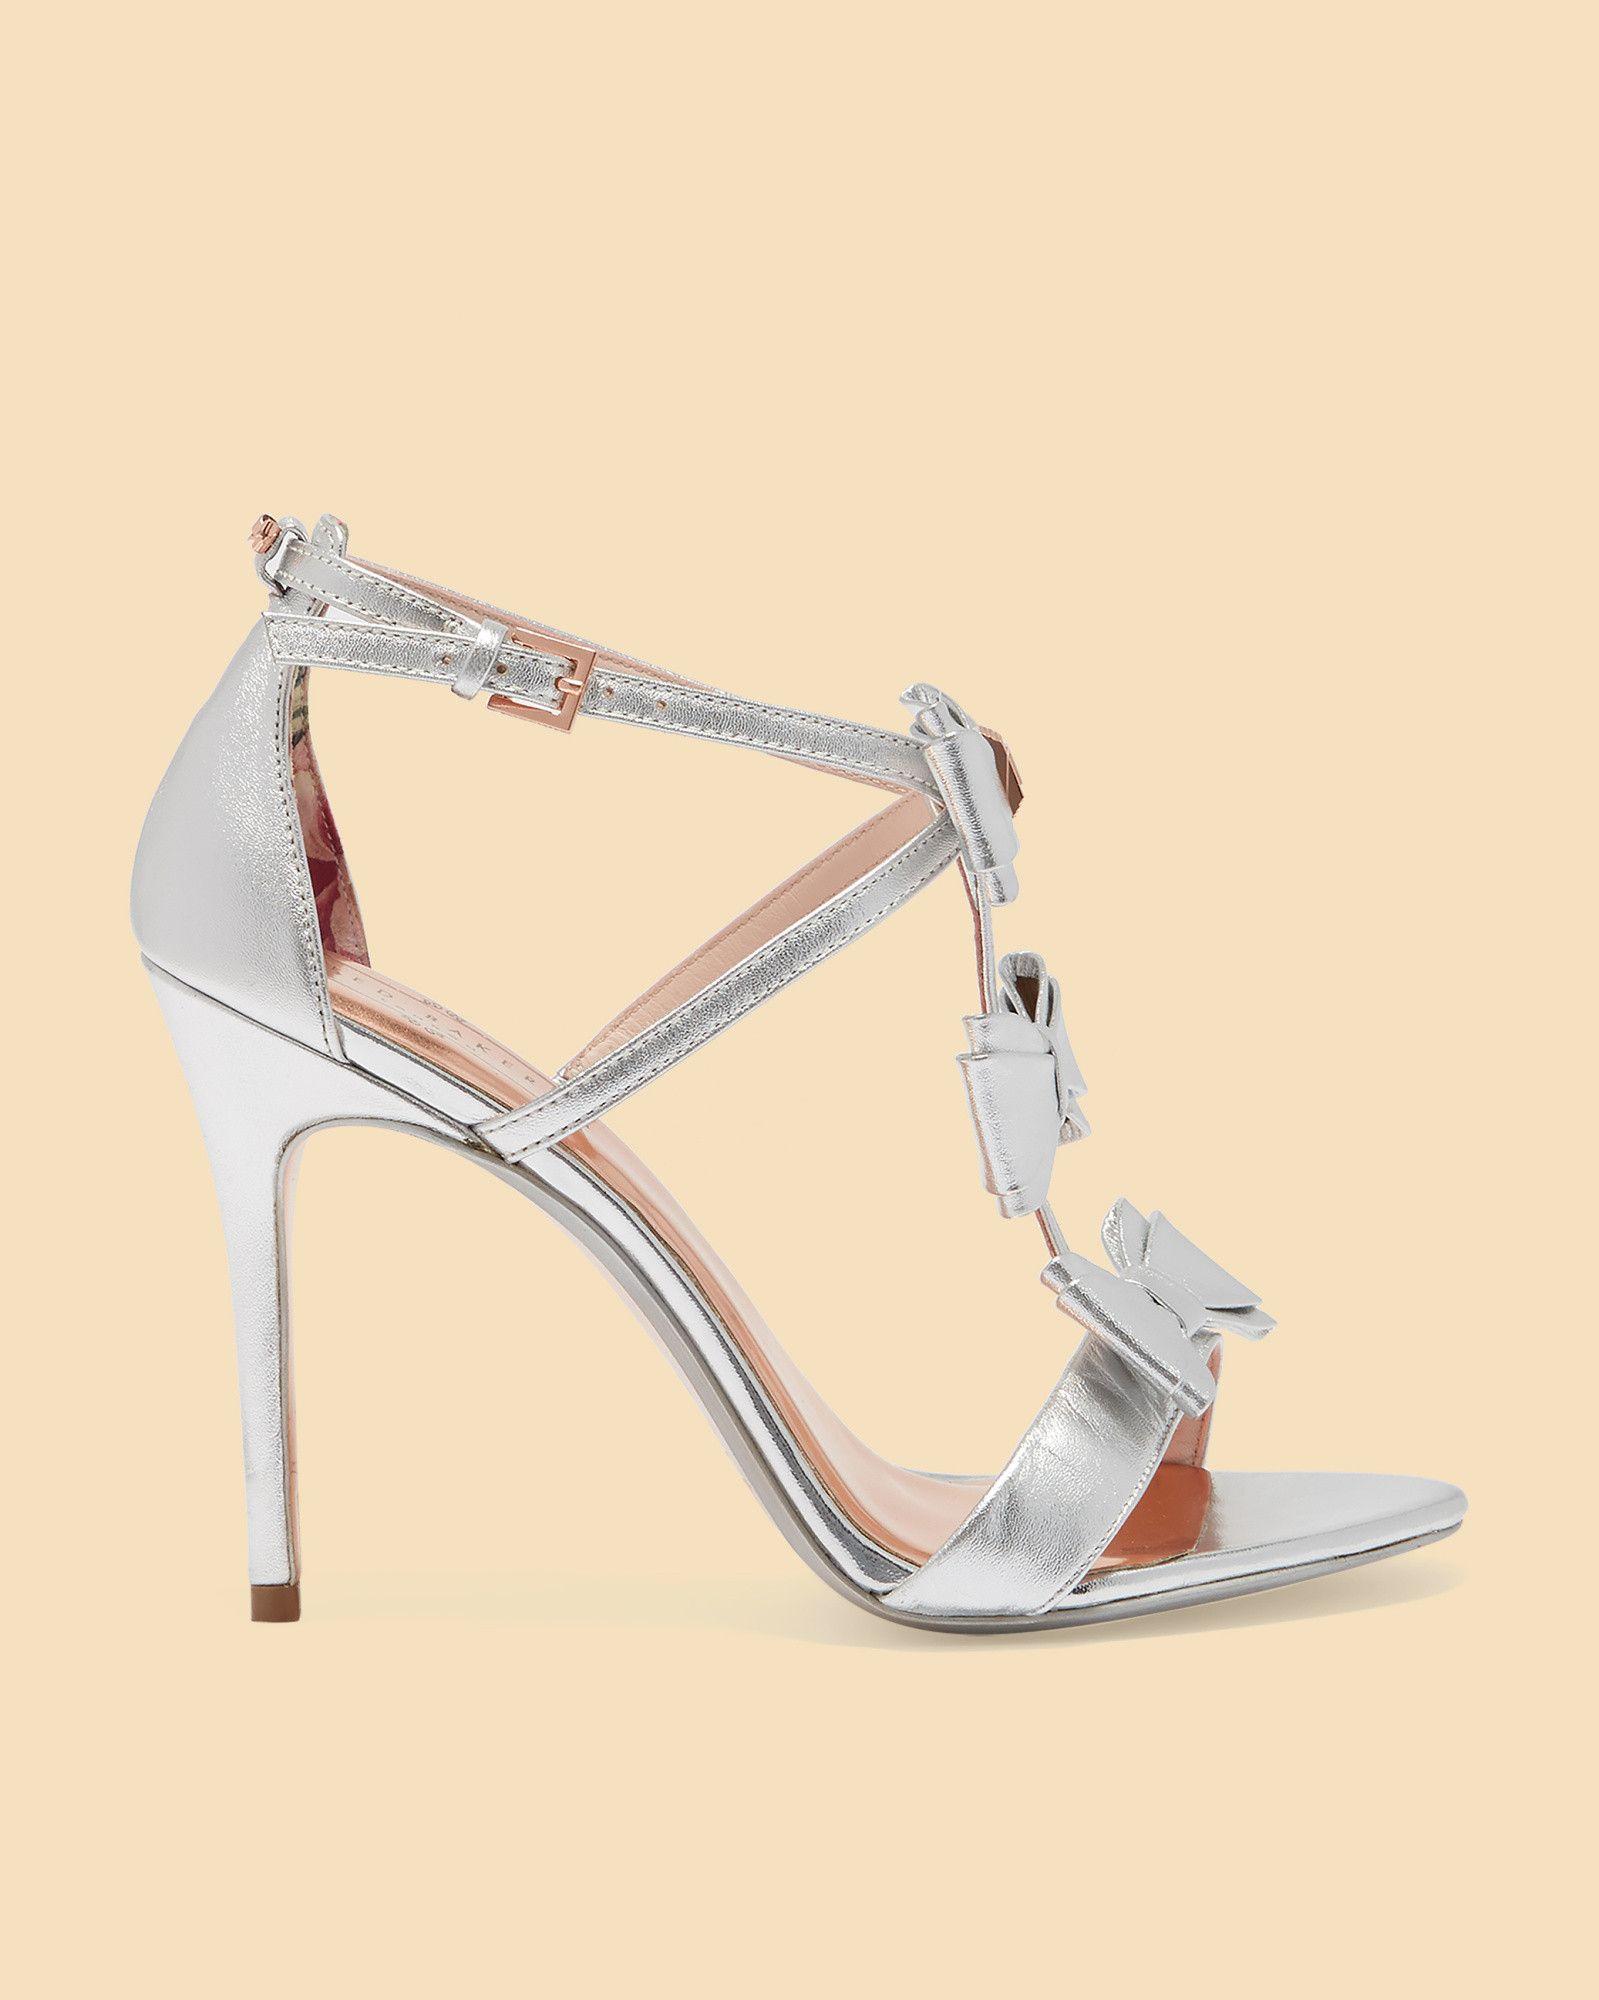 9d5decd34 Ted Baker Triple bow detail heeled sandals Black